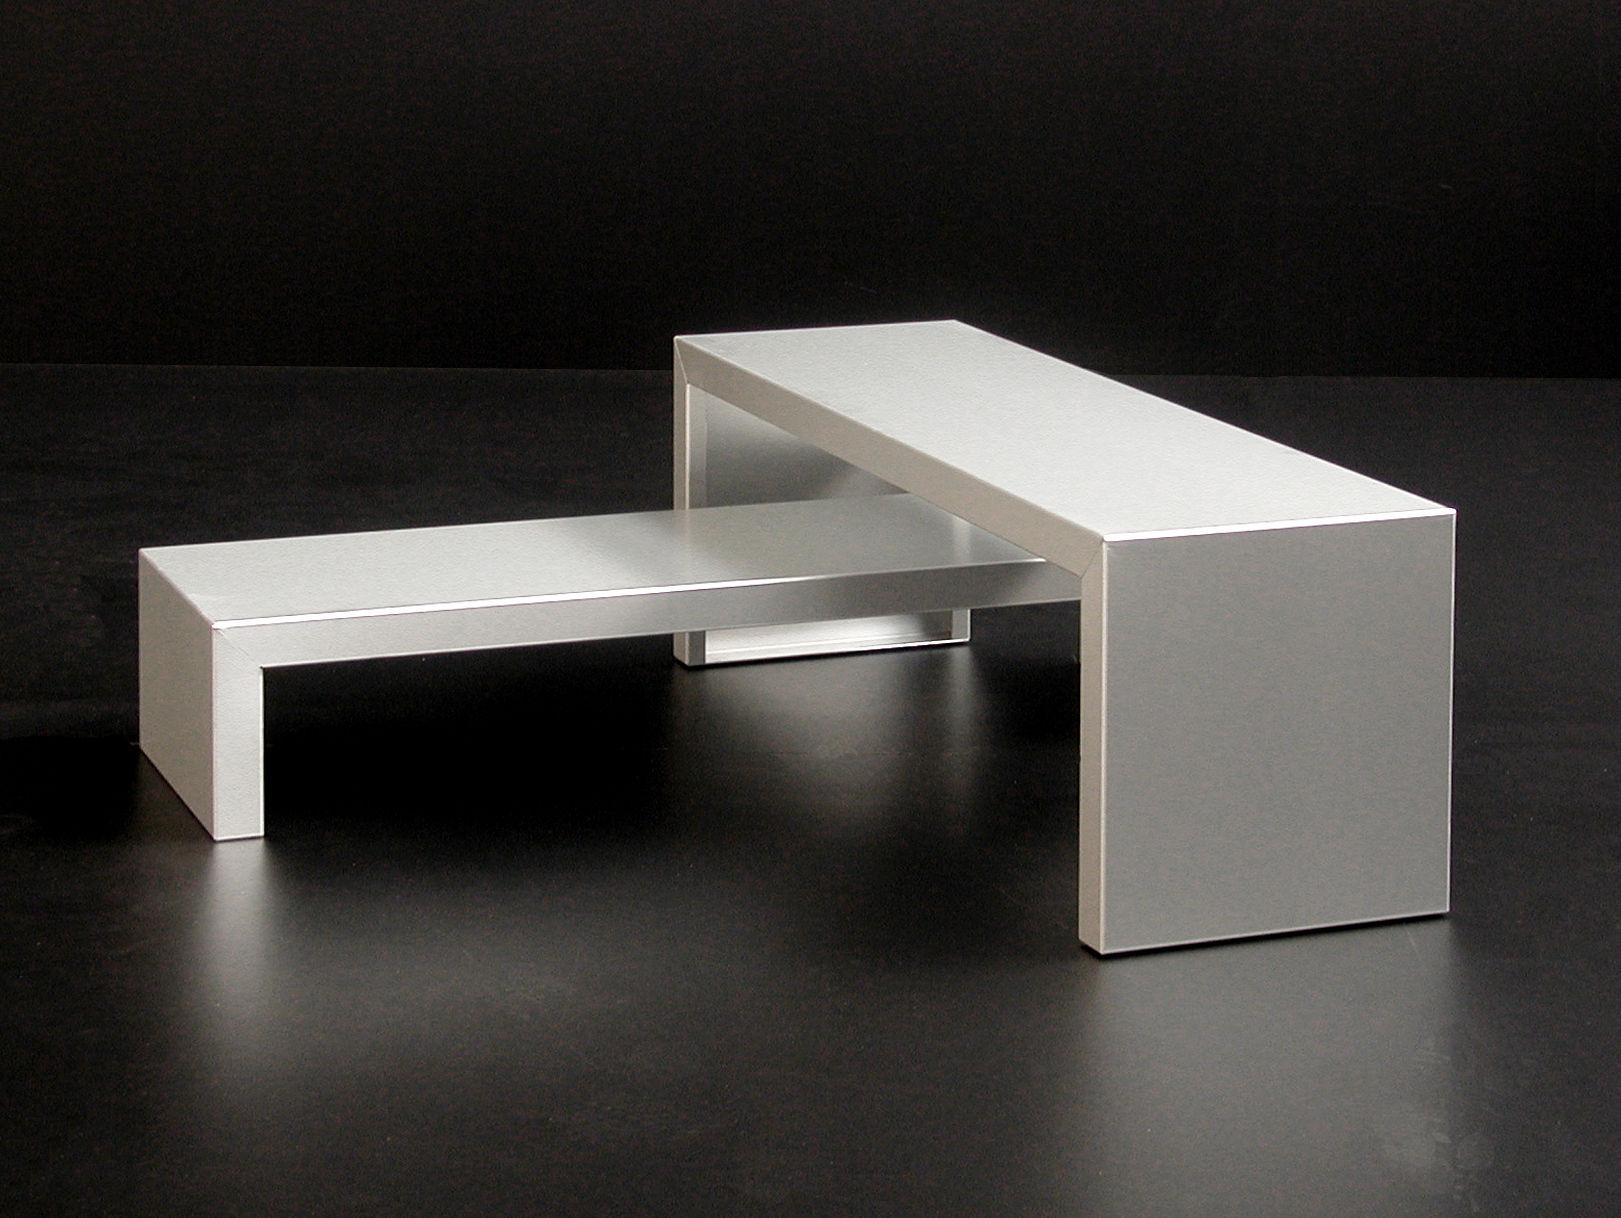 table basse small al l 68 x h 20 cm zeus. Black Bedroom Furniture Sets. Home Design Ideas